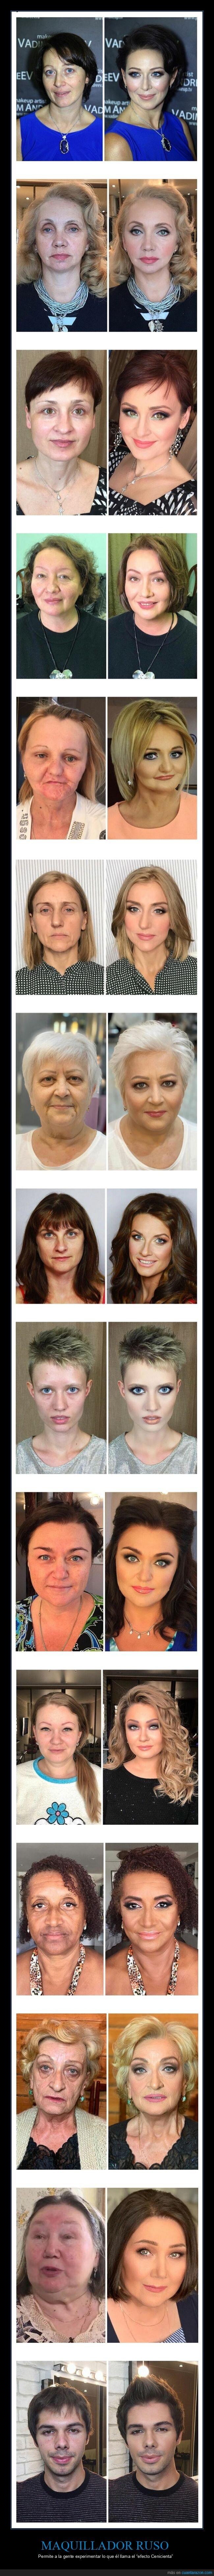 antes,después,maquillaje